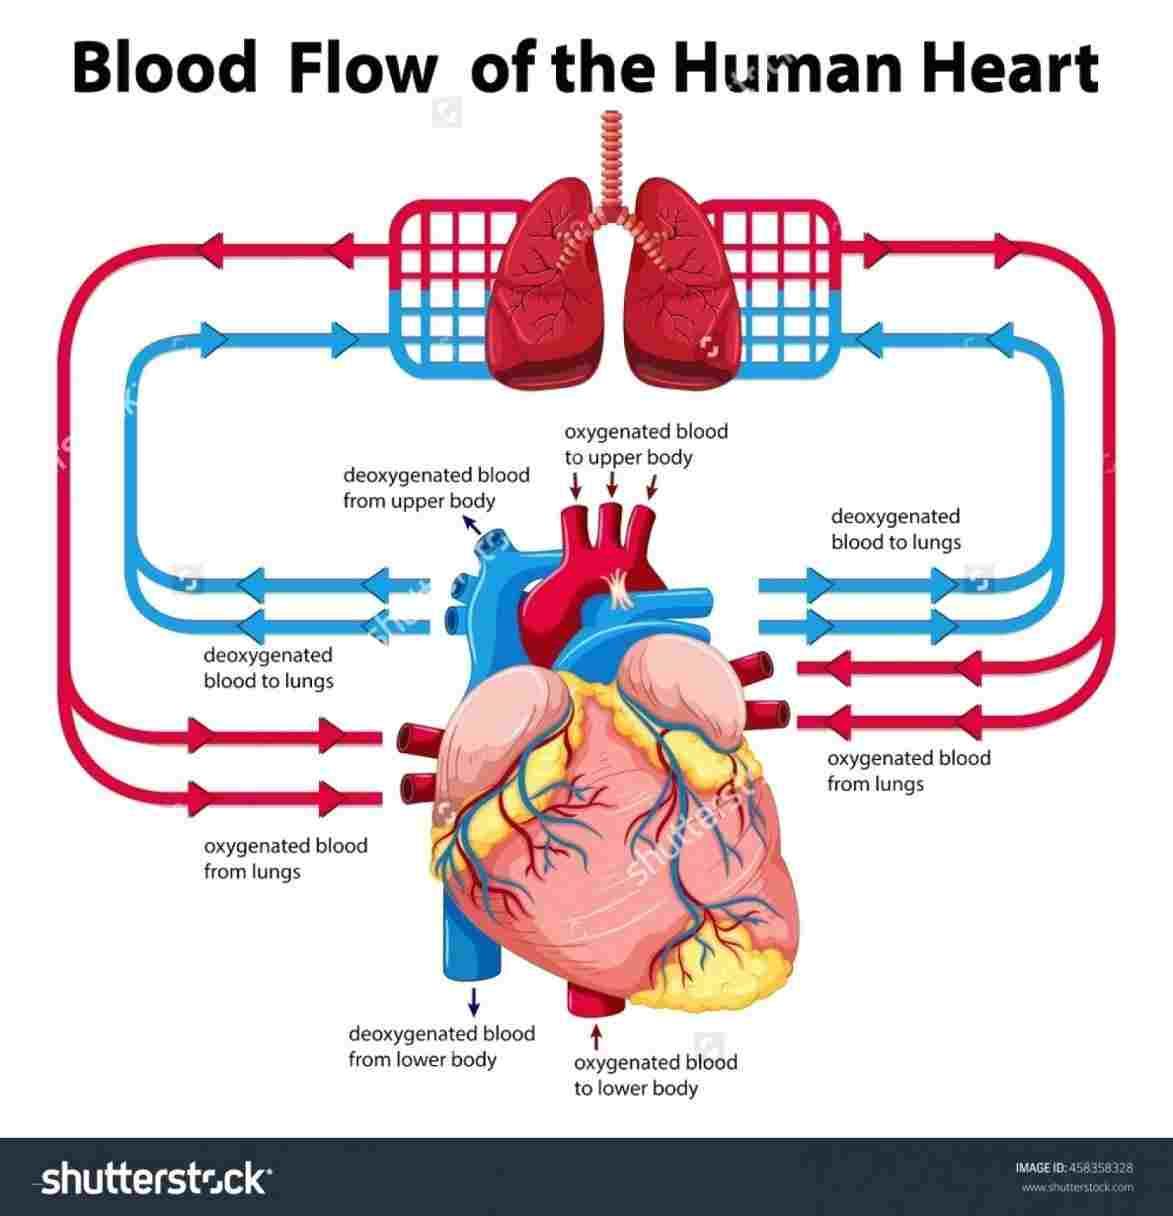 Heart Blood Flow Diagram Circulatory Human Heart Blood Flow Diagram System Blood Flow Diagram